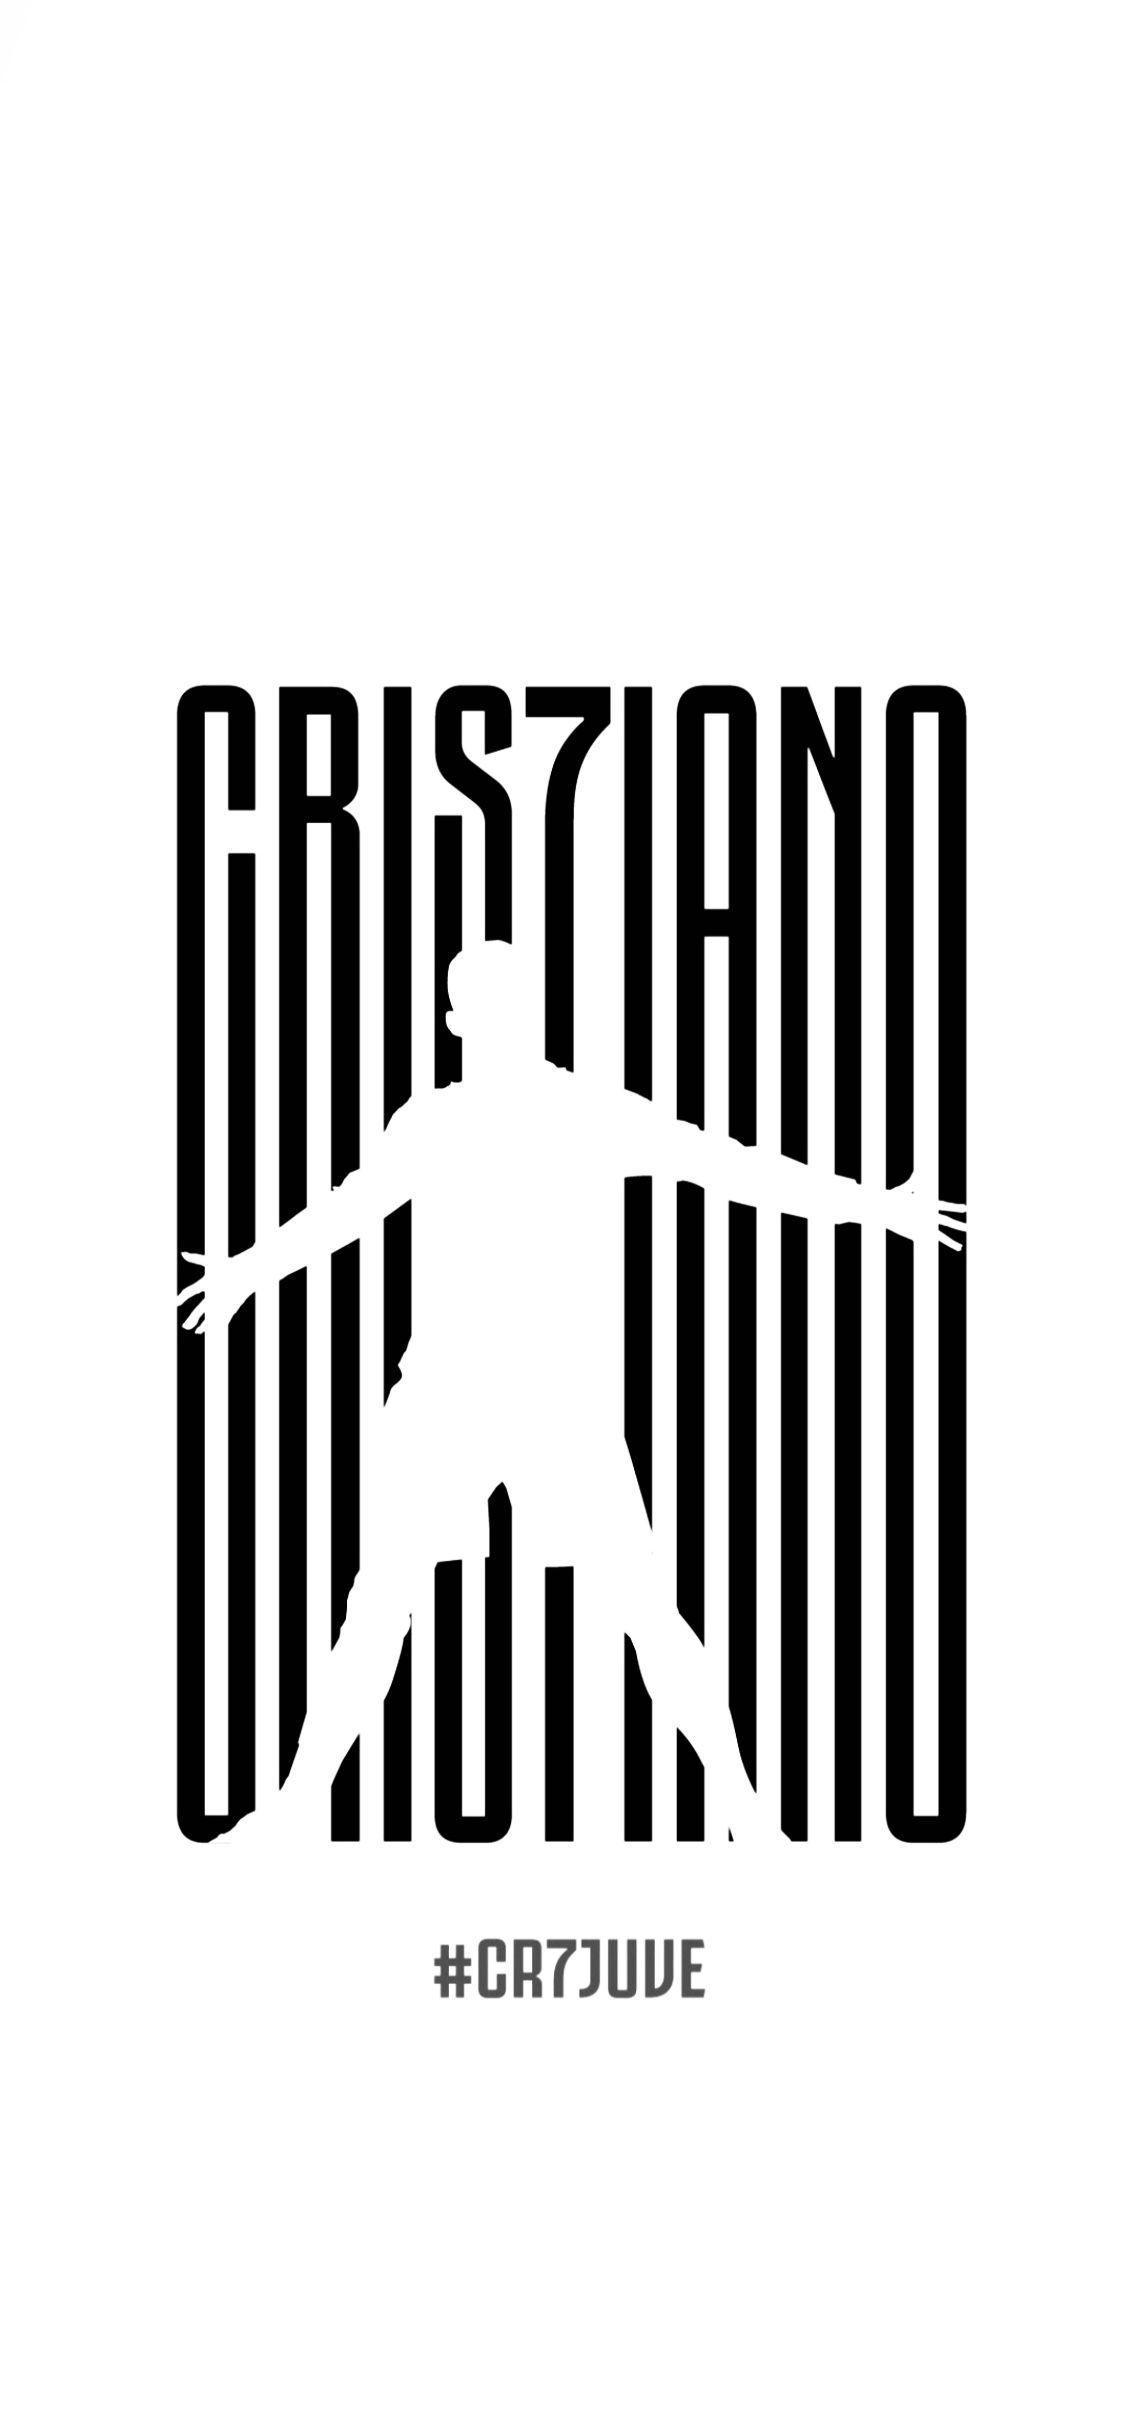 Ronaldo Juventus Wallpaper Iphone Hd Football